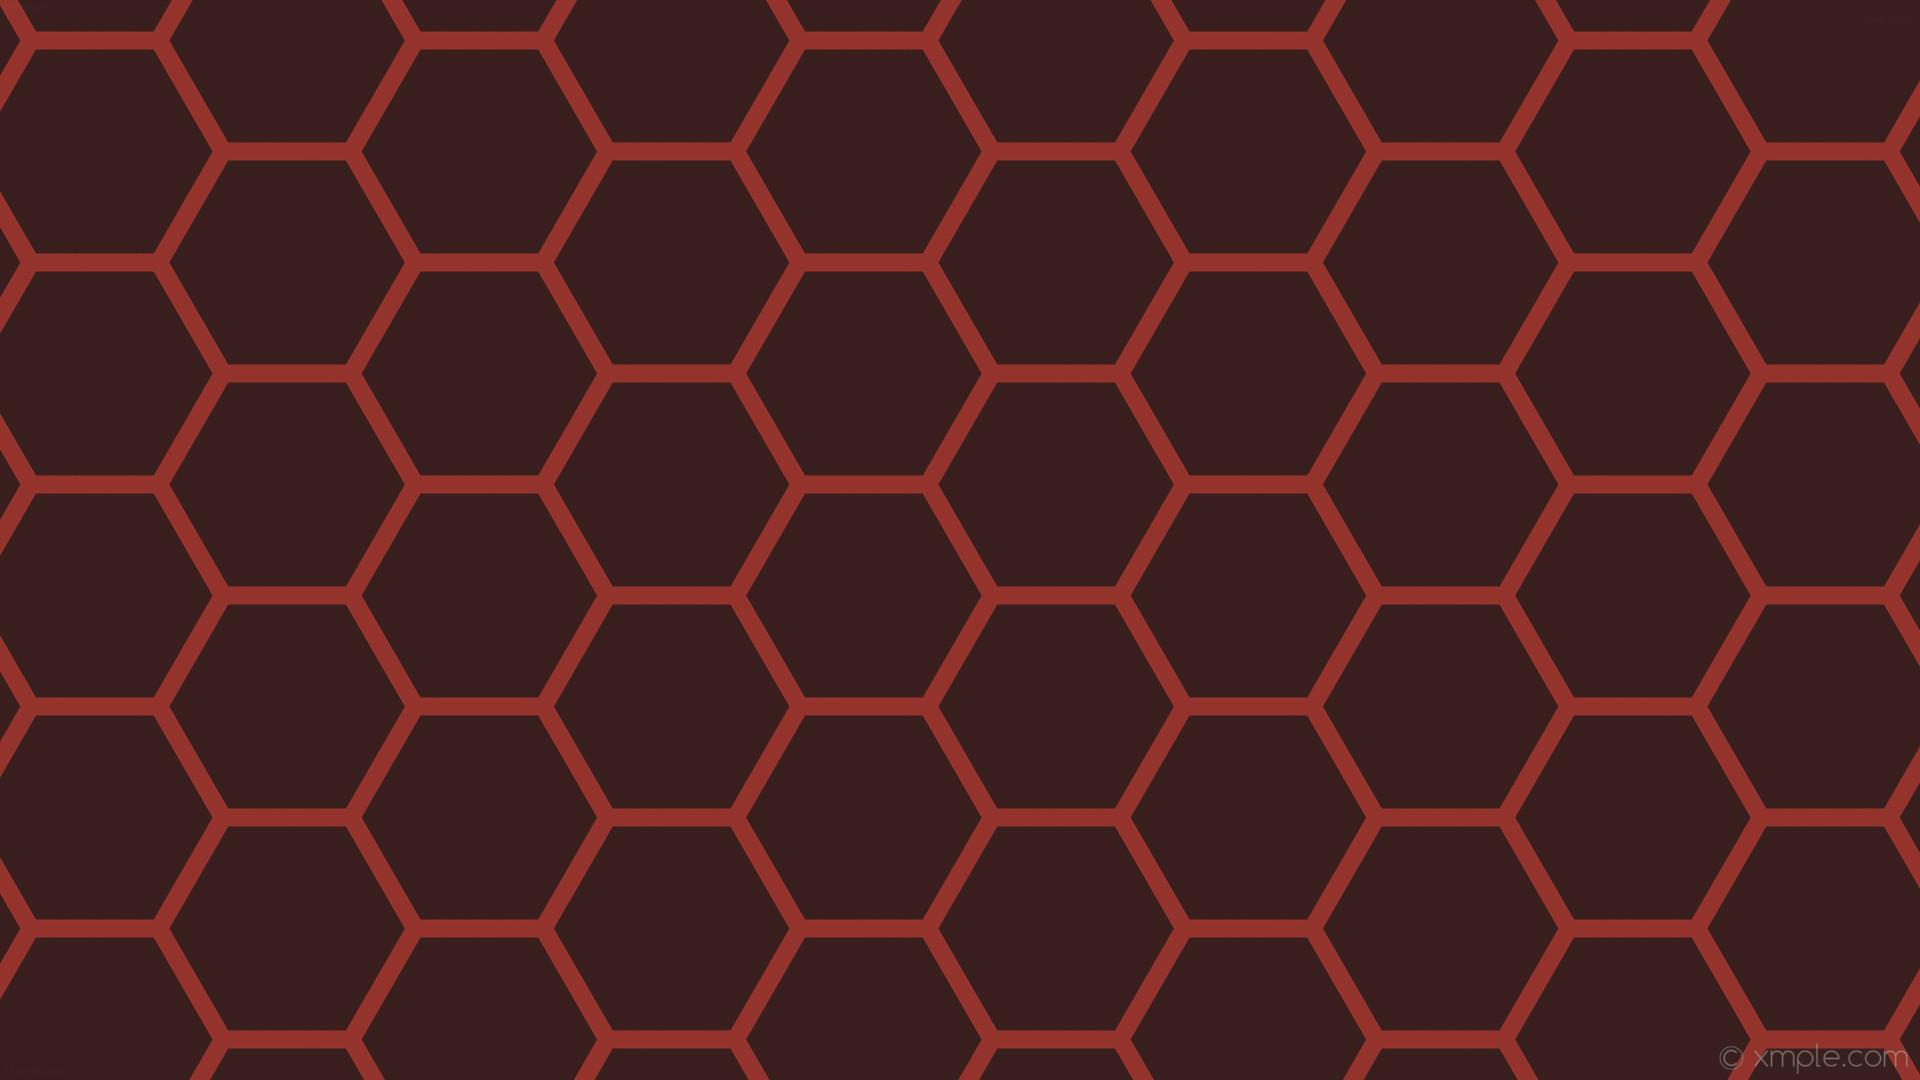 wallpaper honeycomb beehive red hexagon dark red #381f1d #94332c diagonal  30° 18px 222px